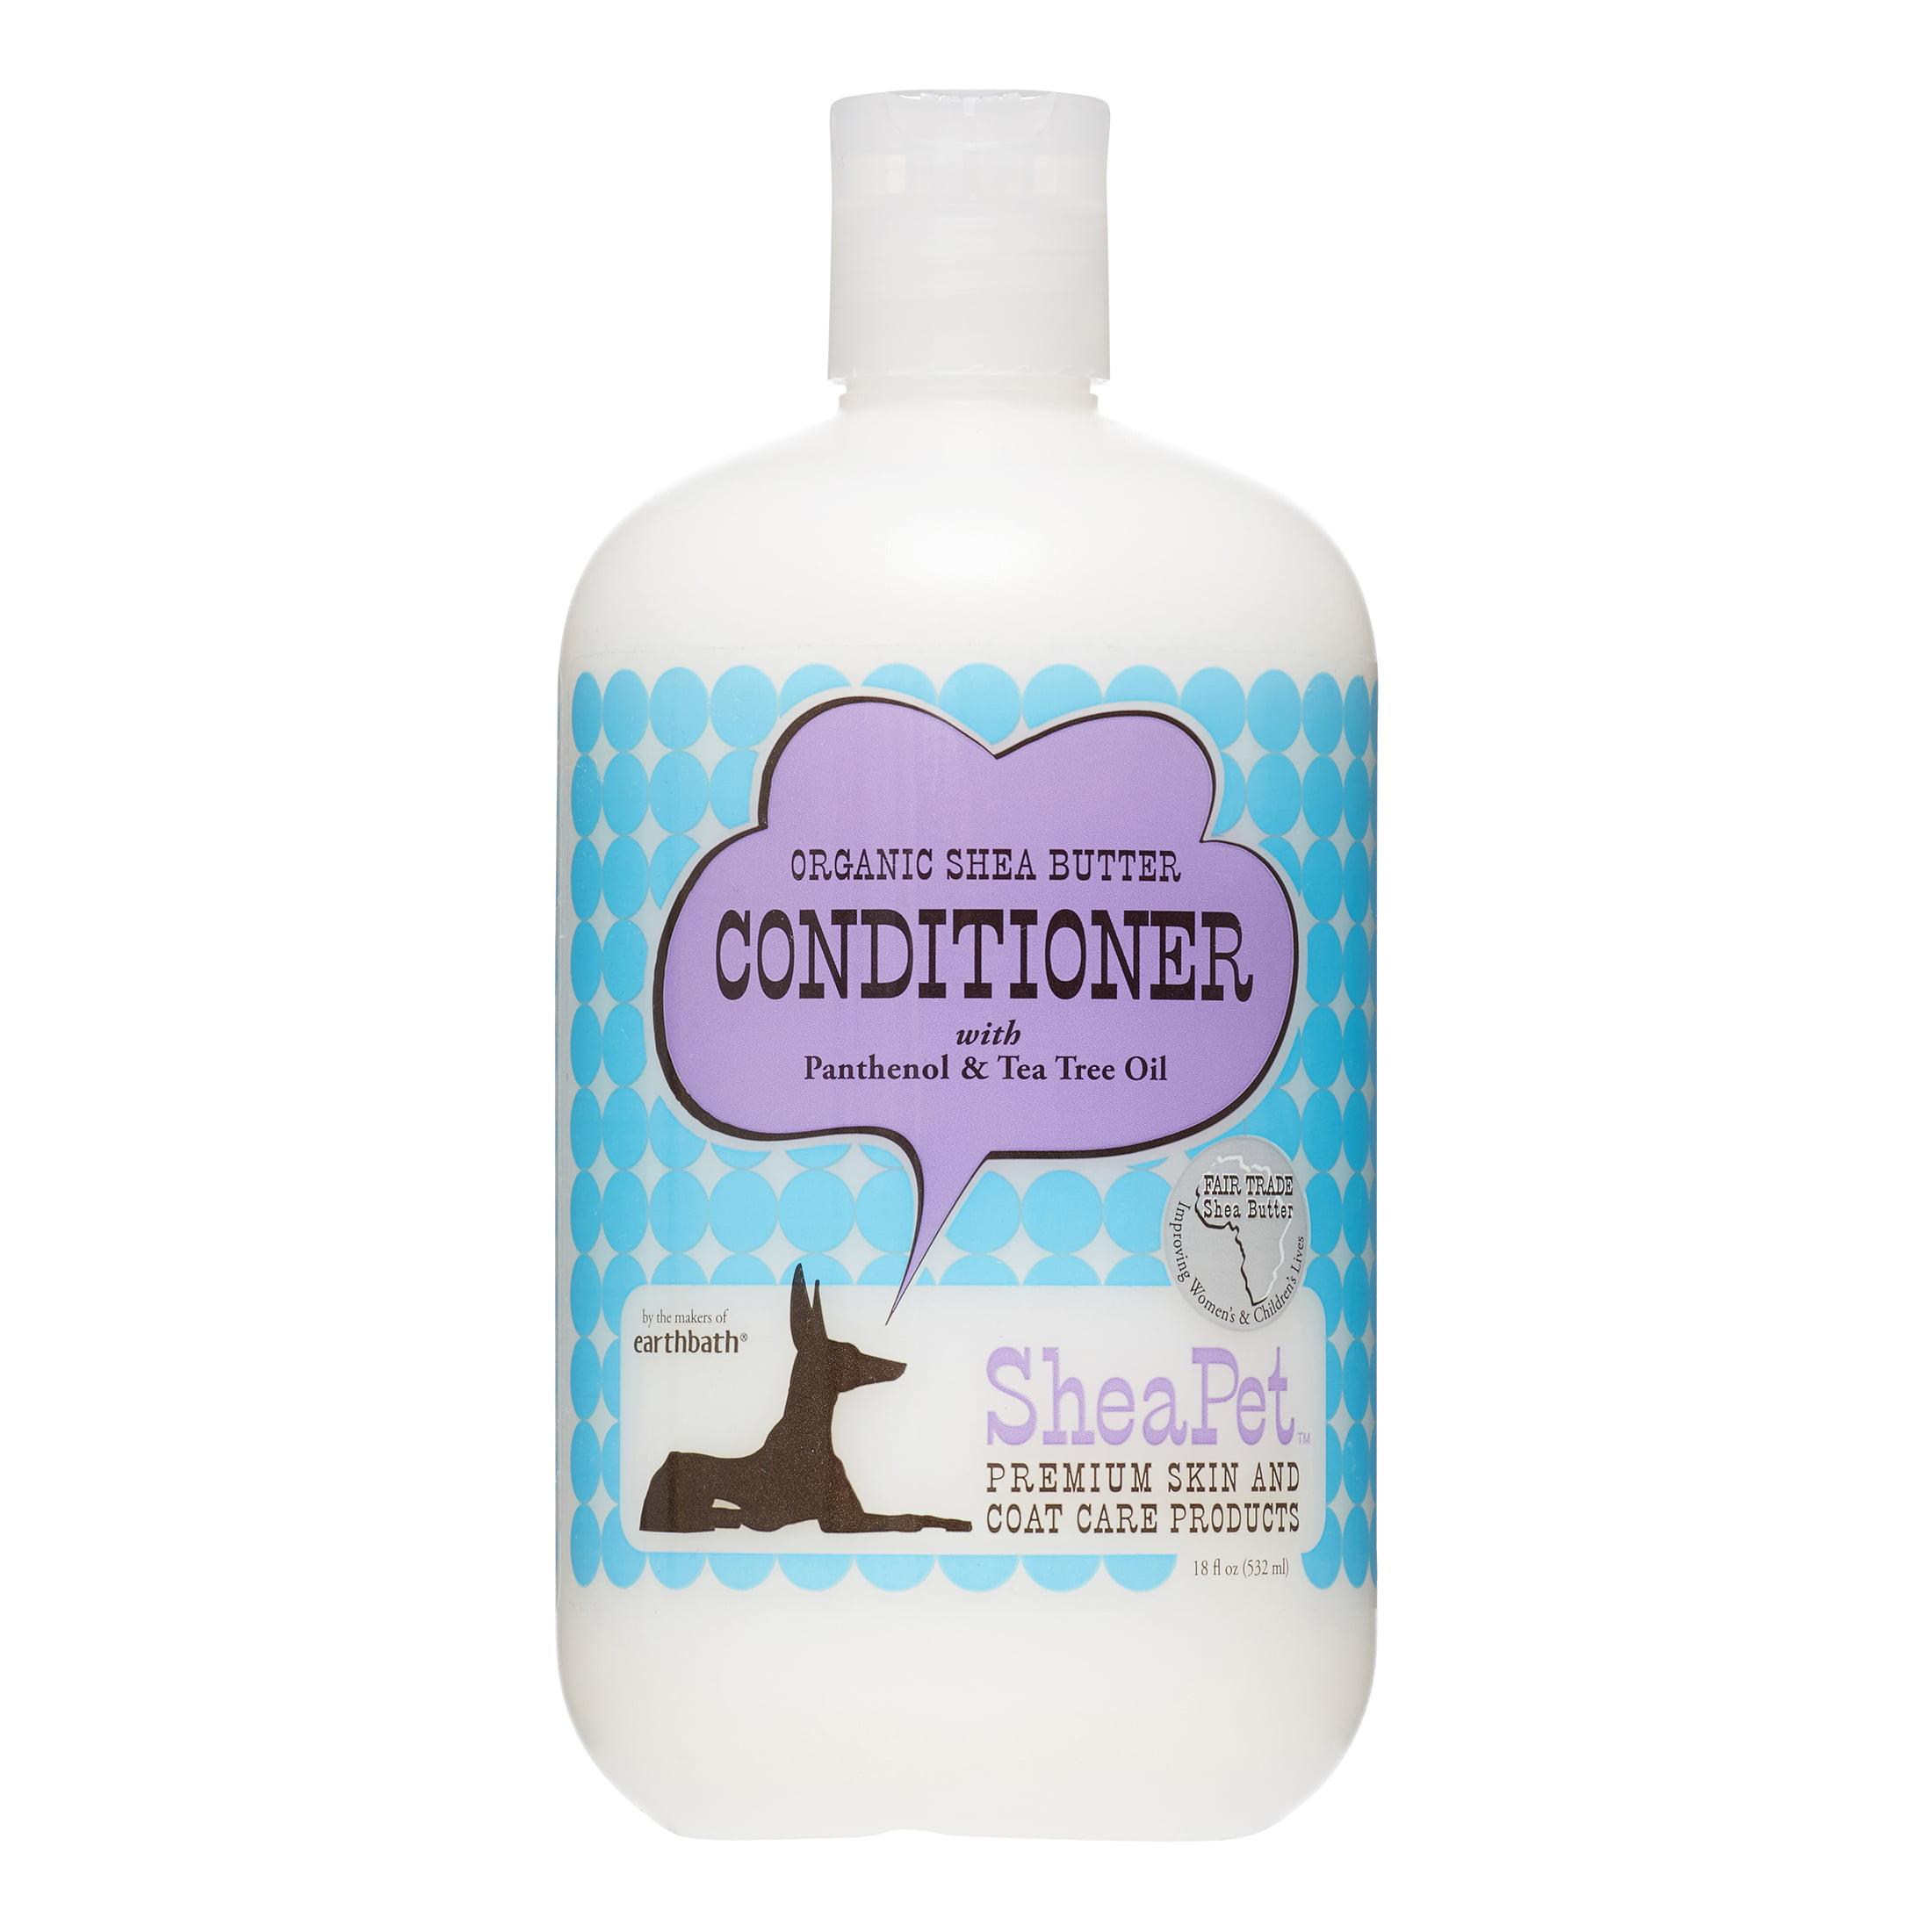 Earthbath Shea Butter Conditioner, 18 Fluid Ounce